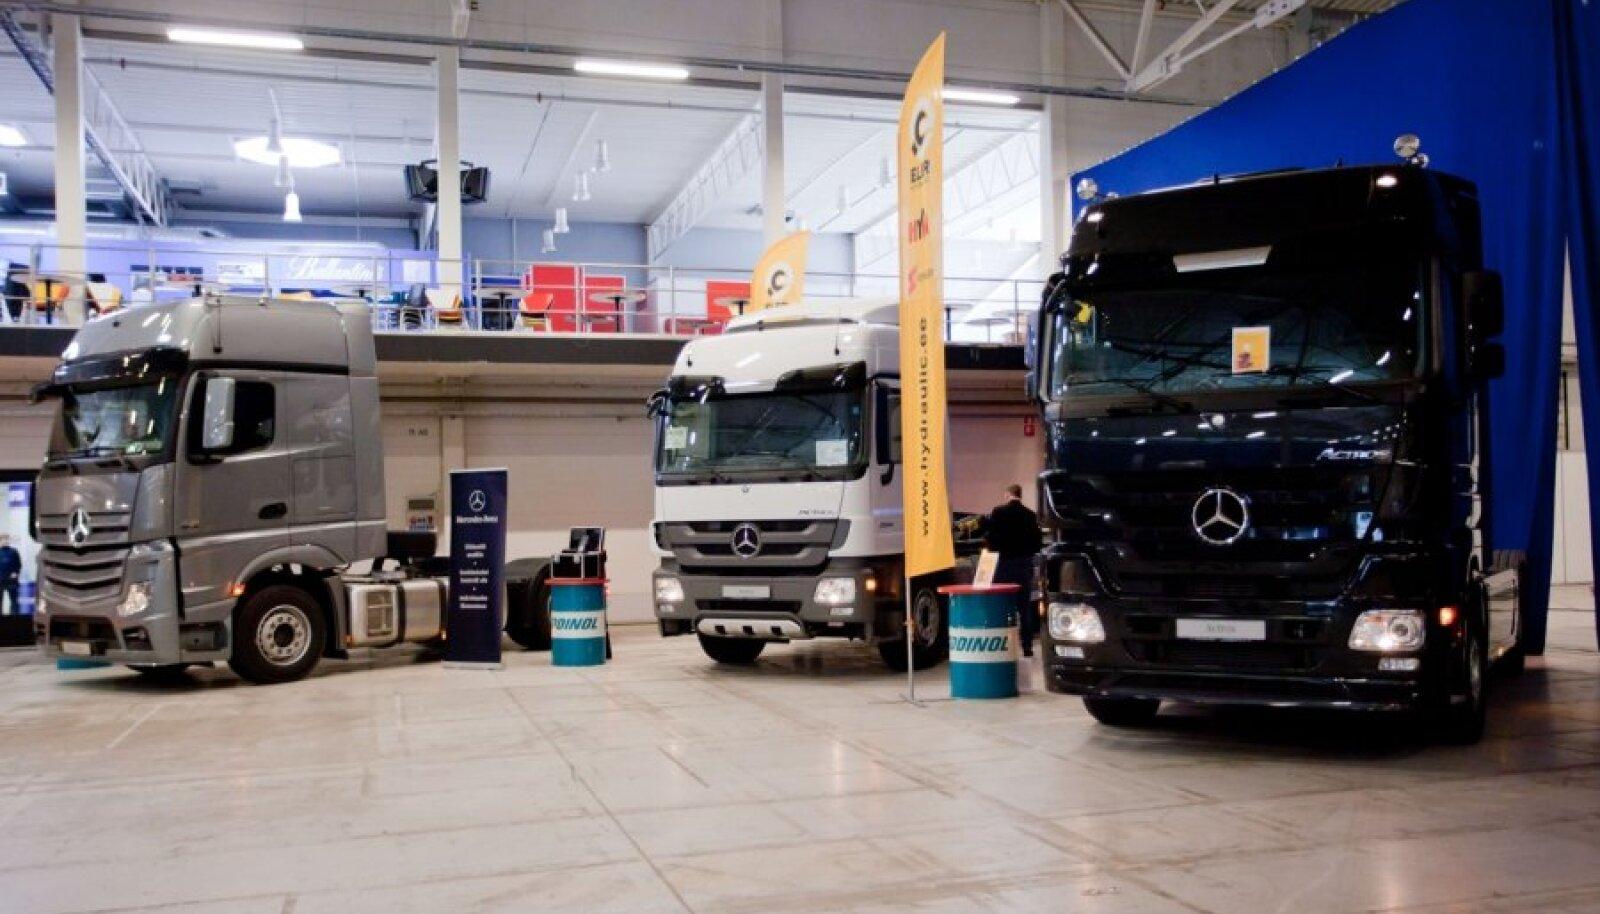 Silberauto Mercedes-Benz veokid Eesti Näituste messikeskuses